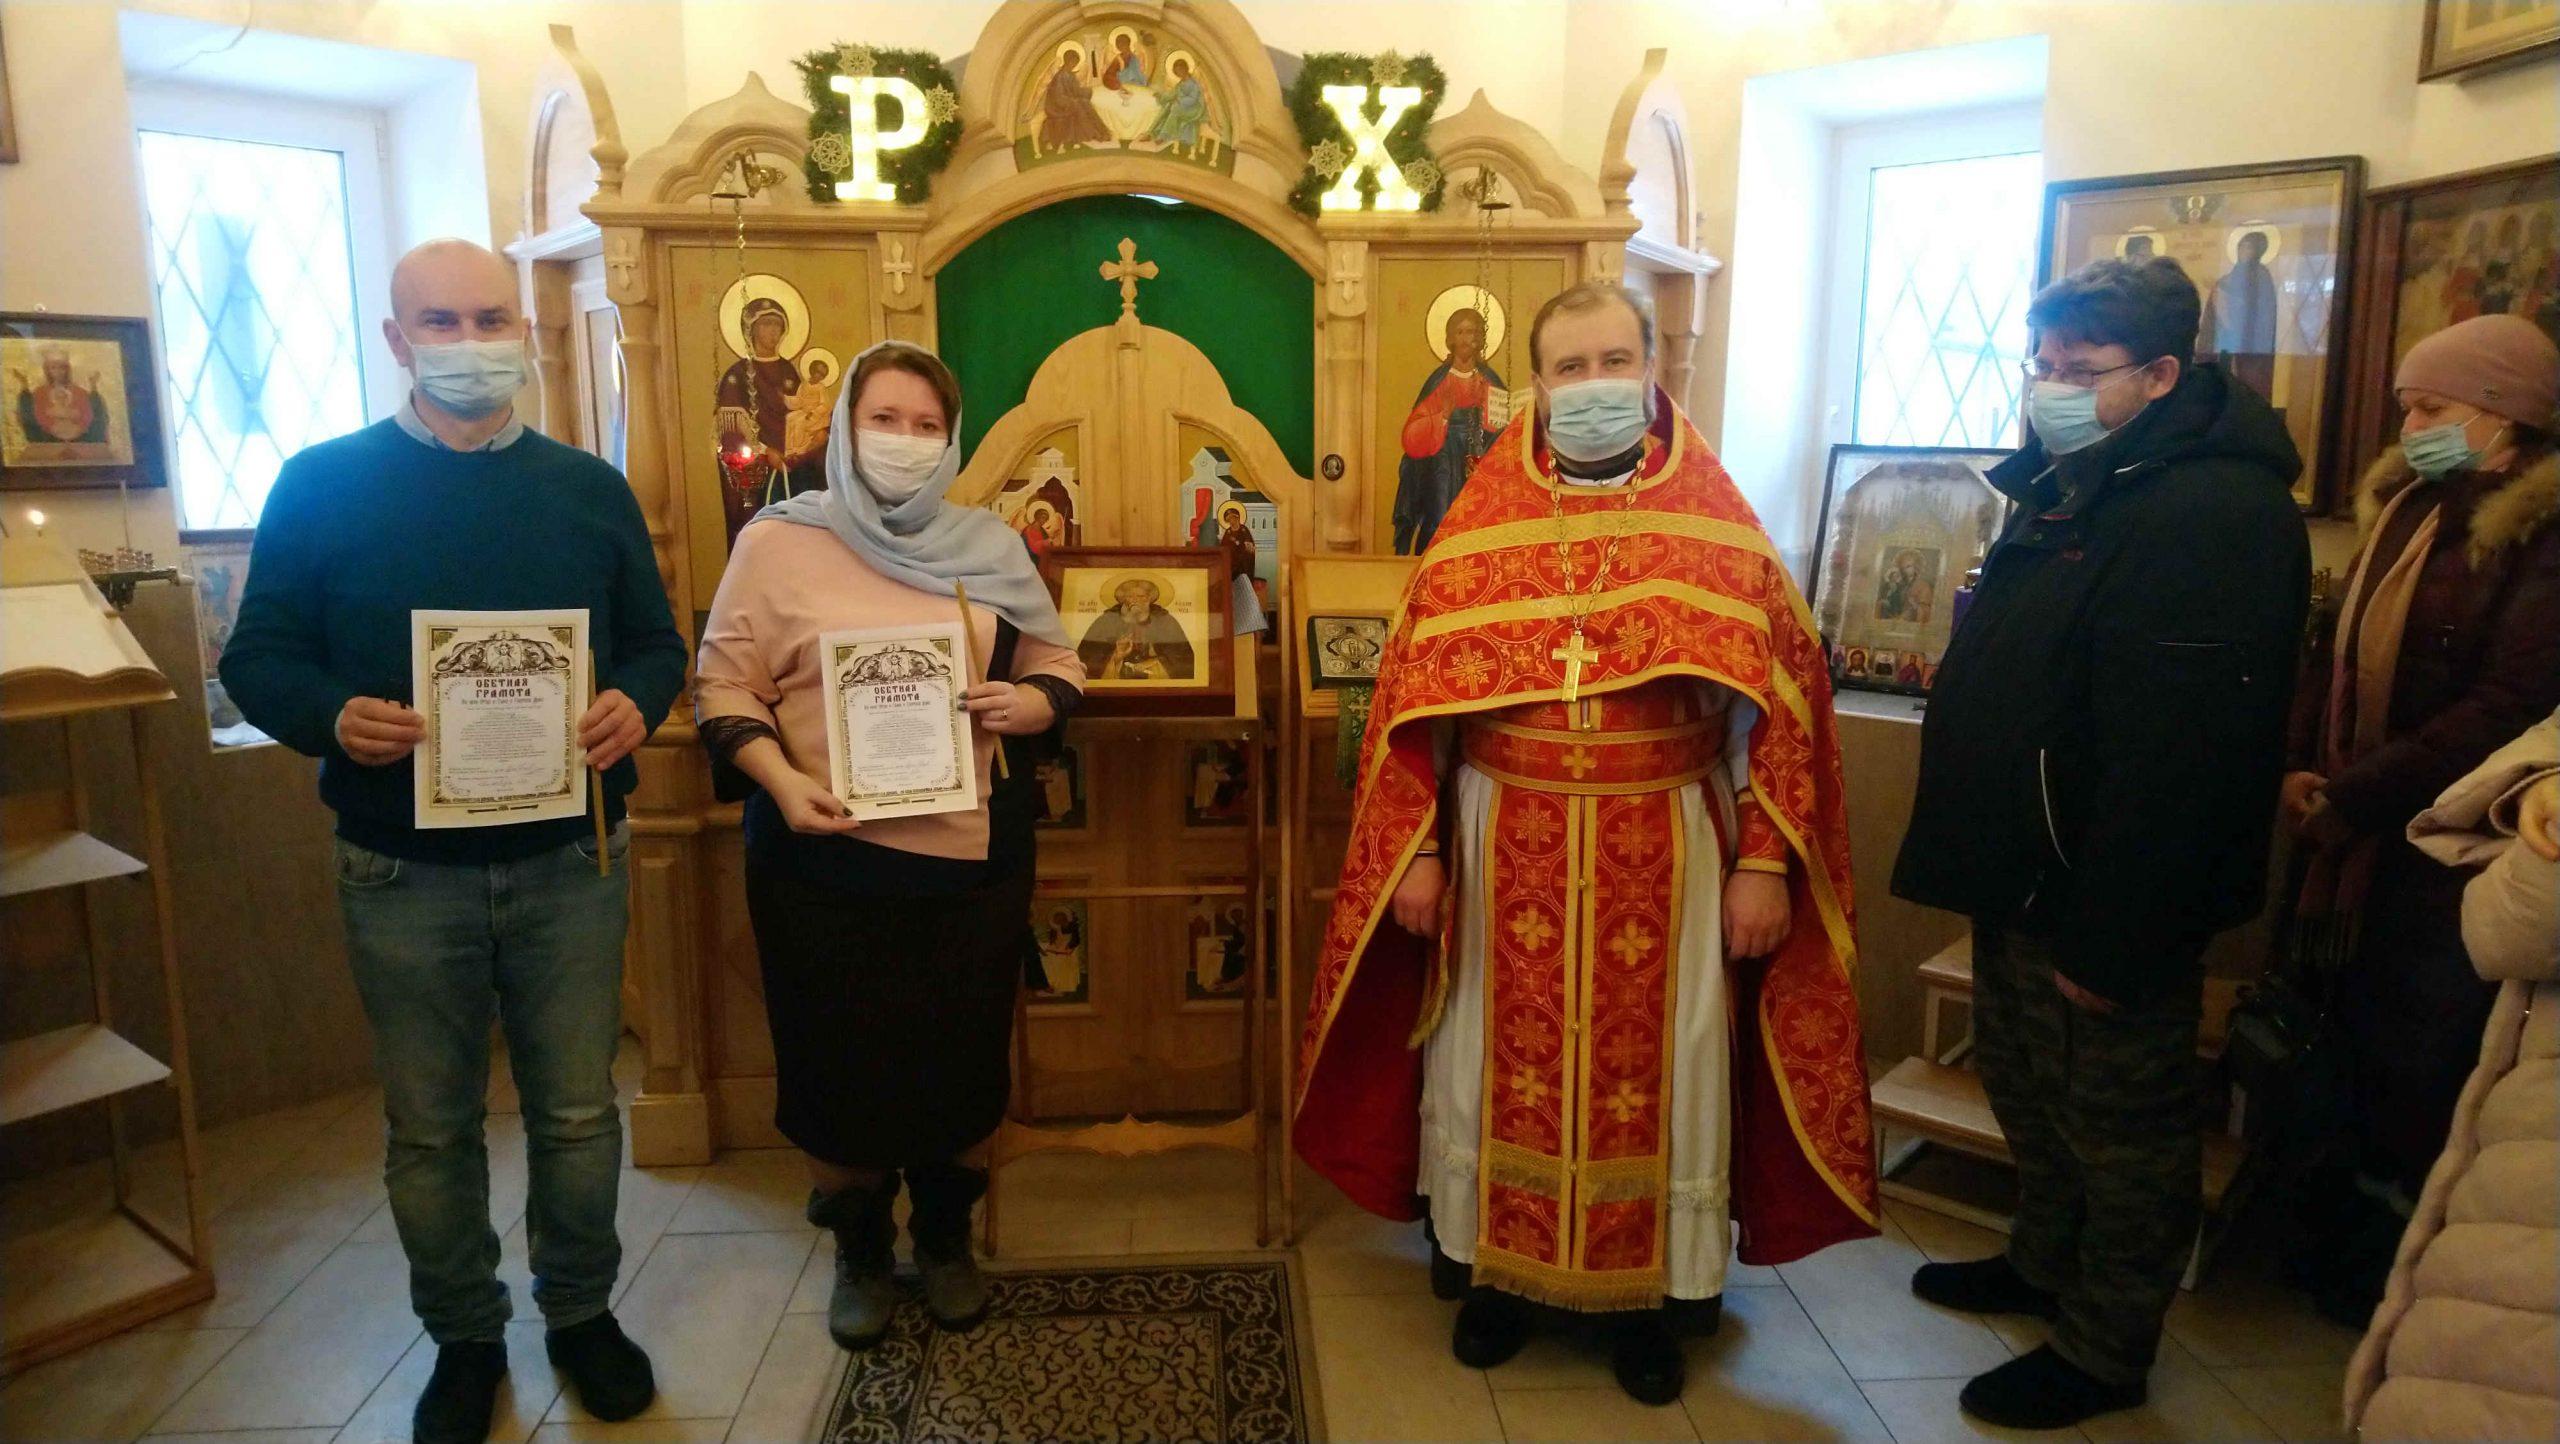 Обет трезвости в семейном клубе трезвости в Красногорске